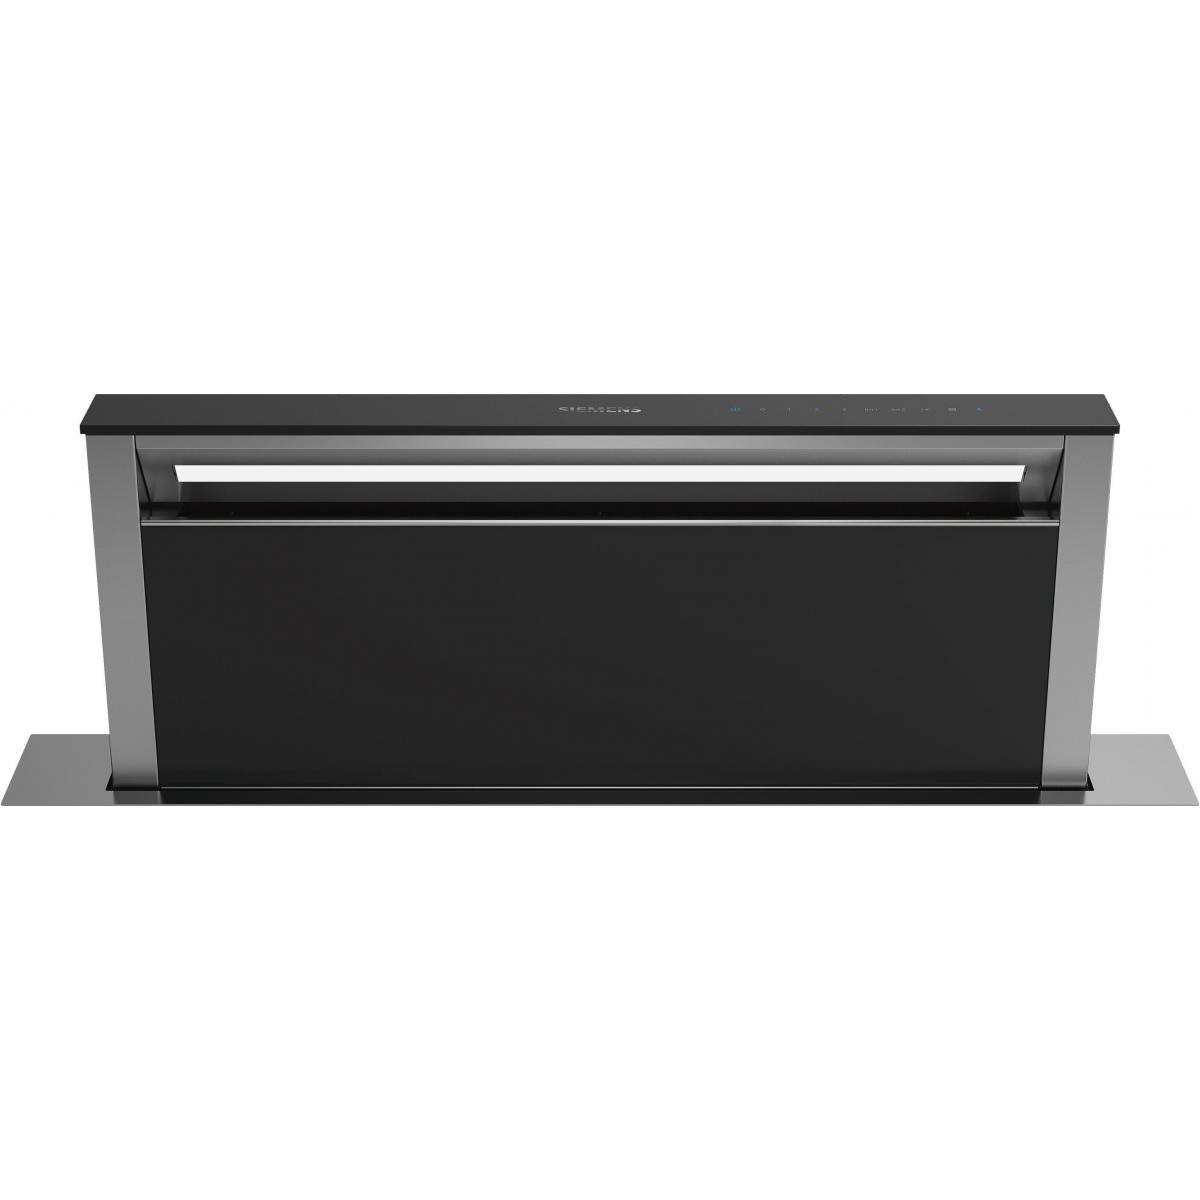 Siemens Hotte tiroir 750m³/h SIEMENS 91cm A, LD 97 DBM 60